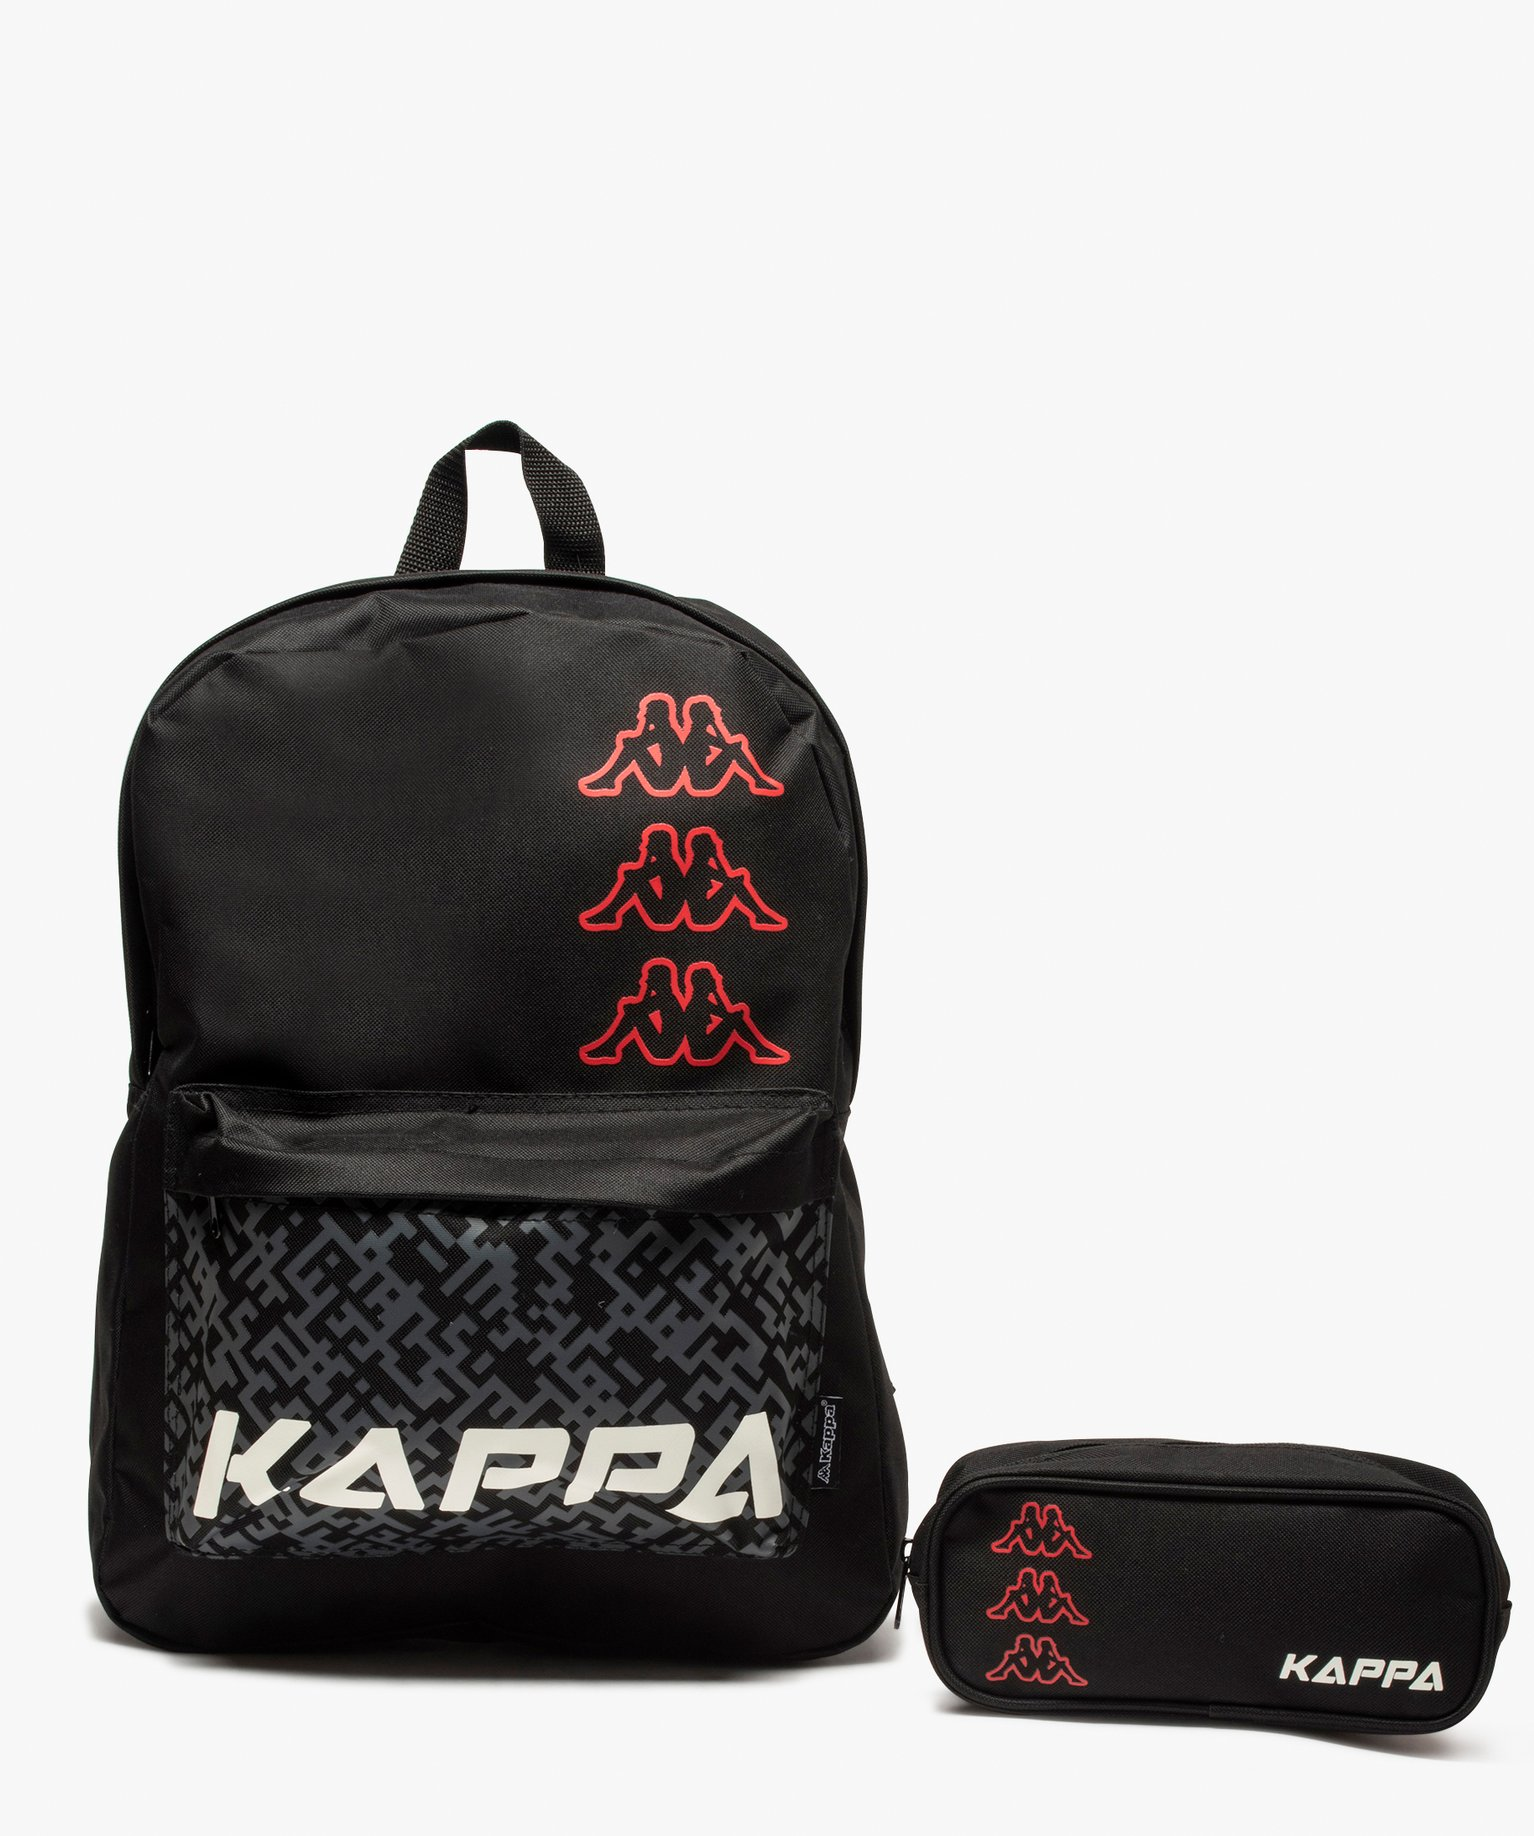 Sac à dos garçon avec trousse assortie - Kappa